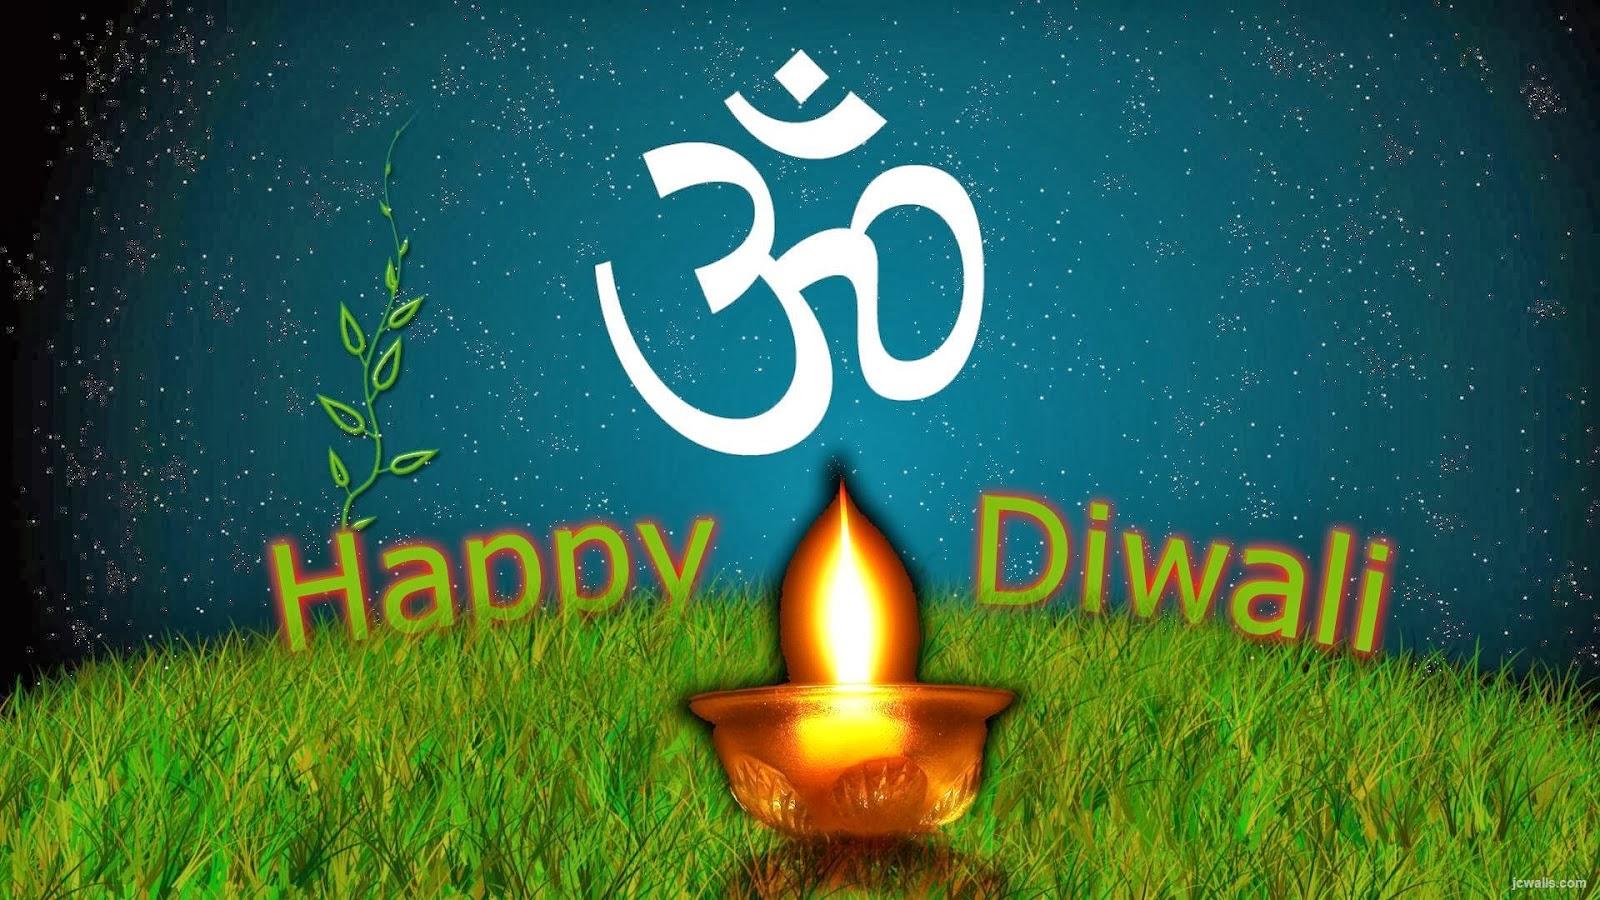 Happy Diwali Desktop Pc Laptop Hd Wallpapers Full Screen: Free Download Diwali Festival 2013 Full Hd Imagess Happy